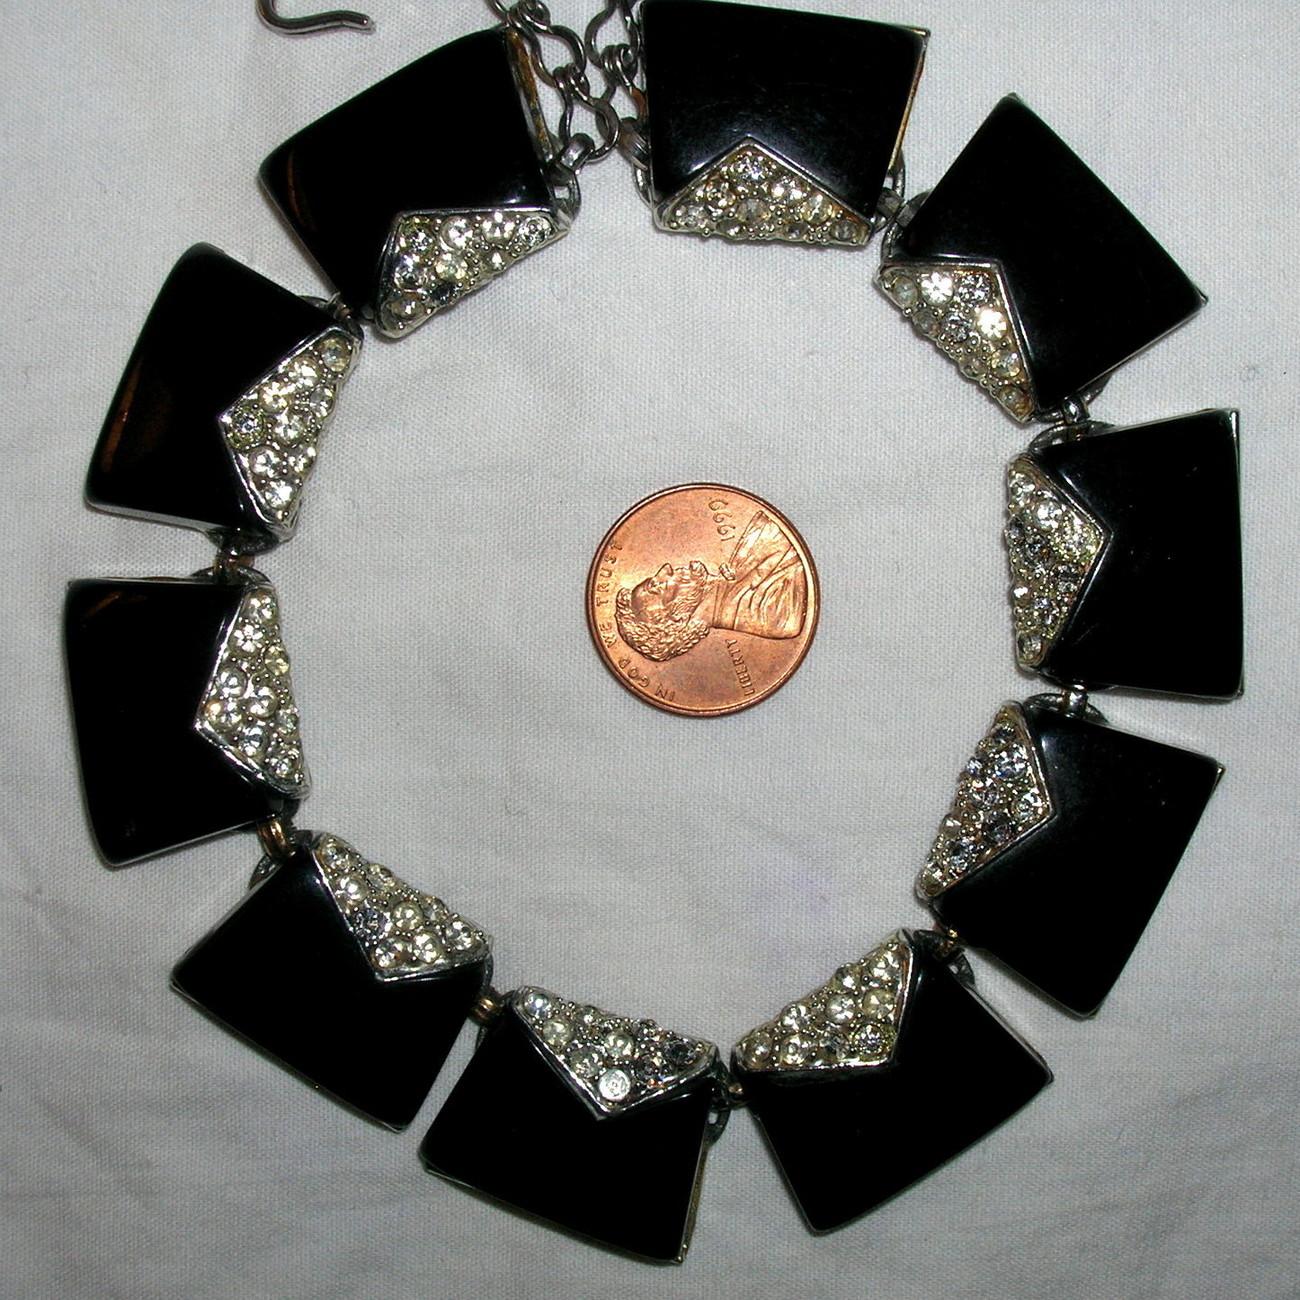 Vintage Charel Art Moderne RhinestoneThermoset Plastic Choker Necklace Black